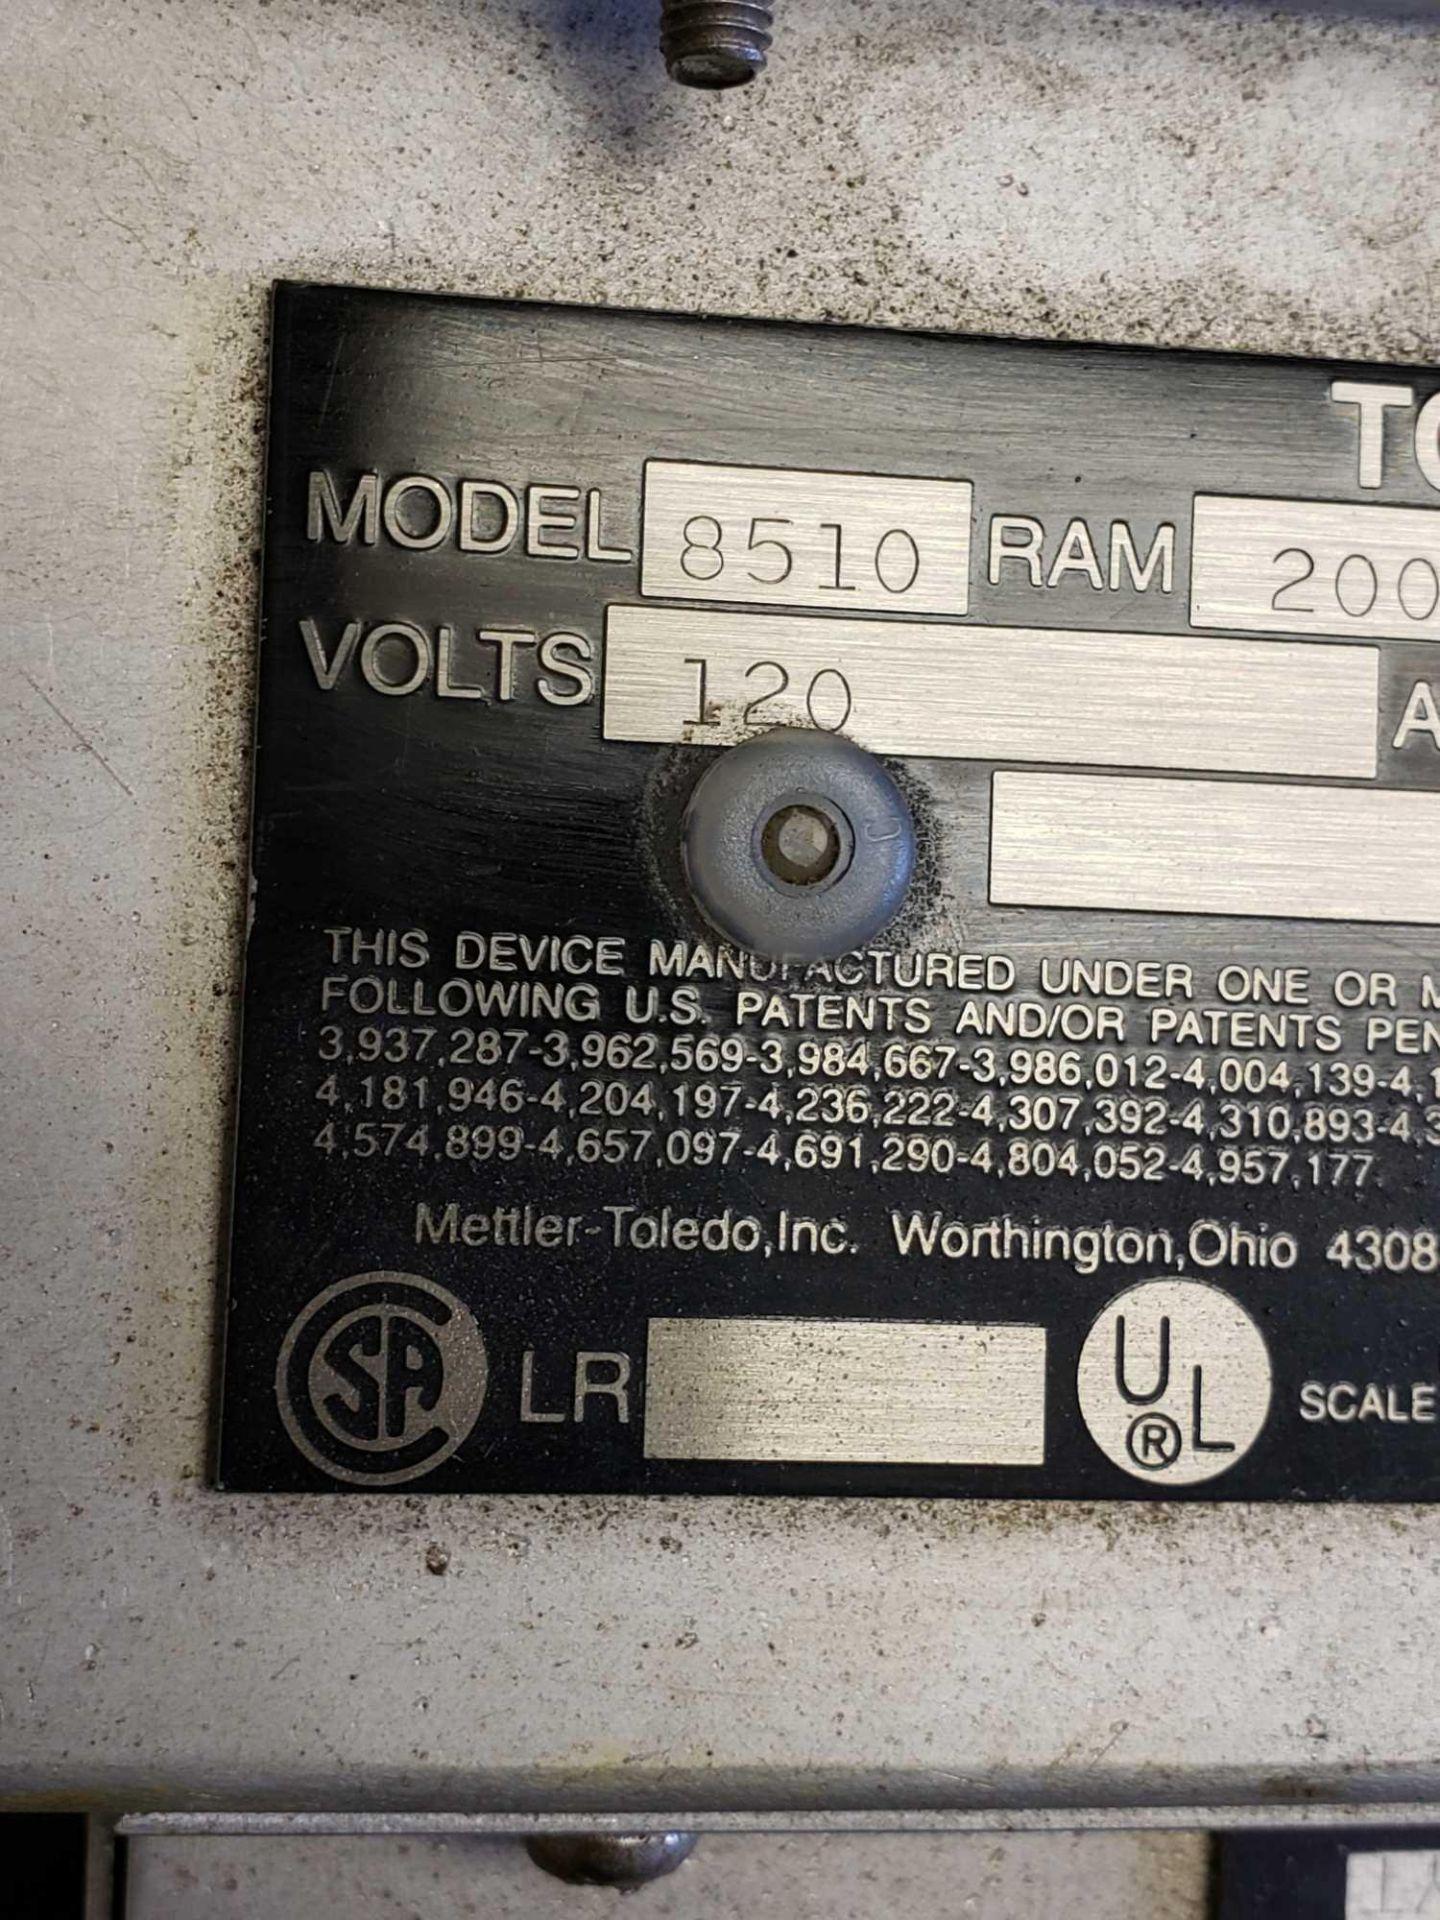 Lot 2 - Toledo scale display model 8510